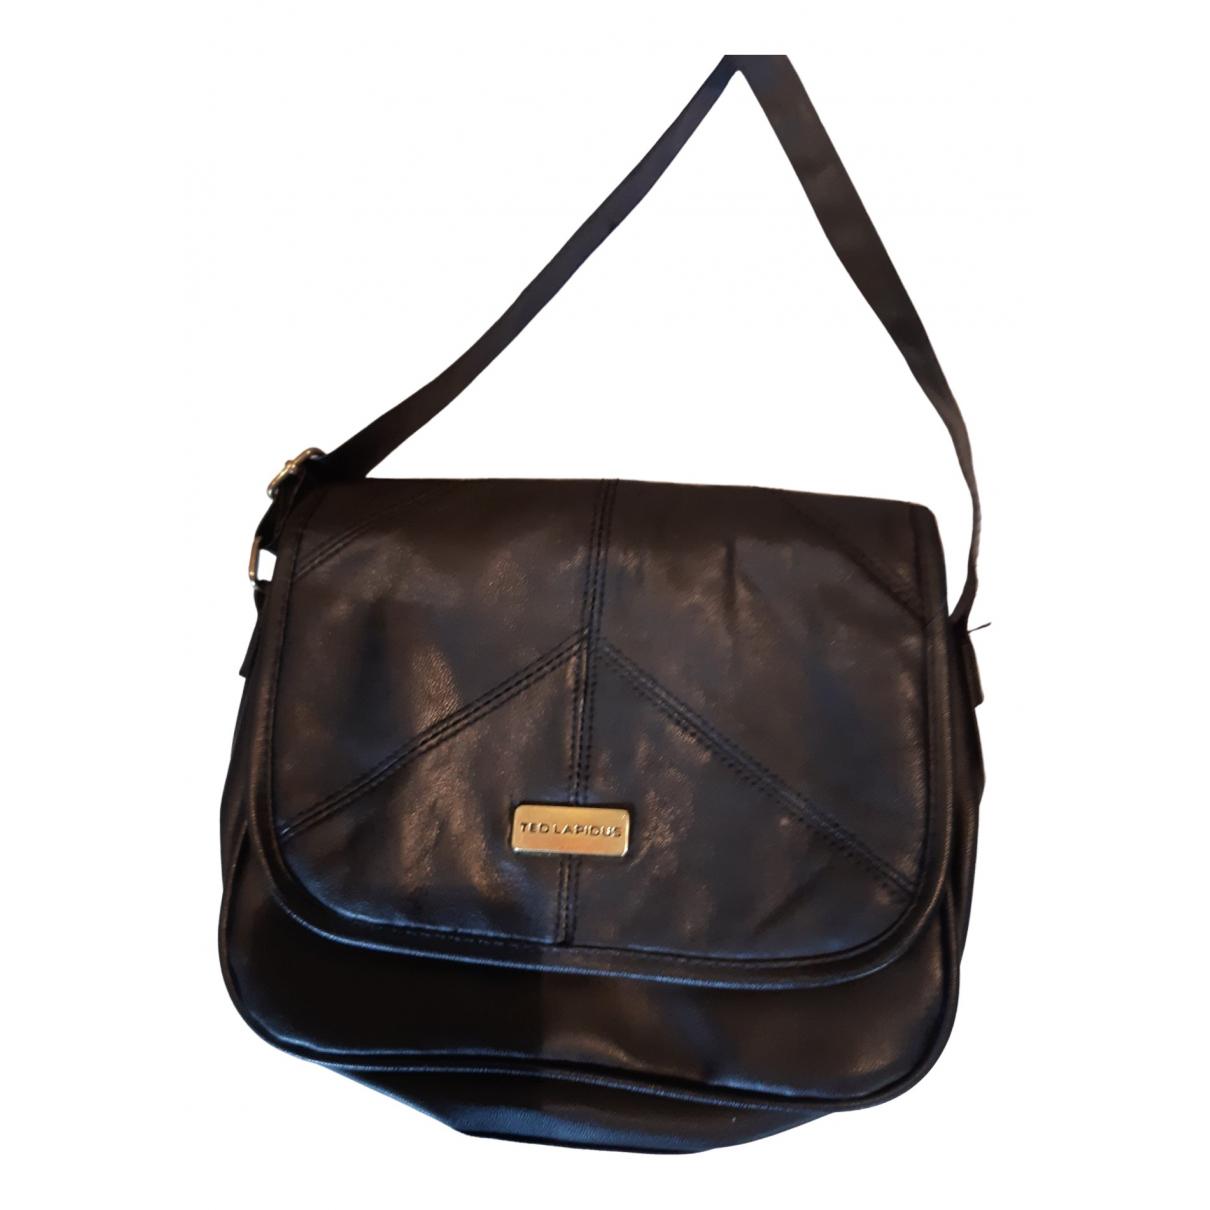 Ted Lapidus \N Blue handbag for Women \N